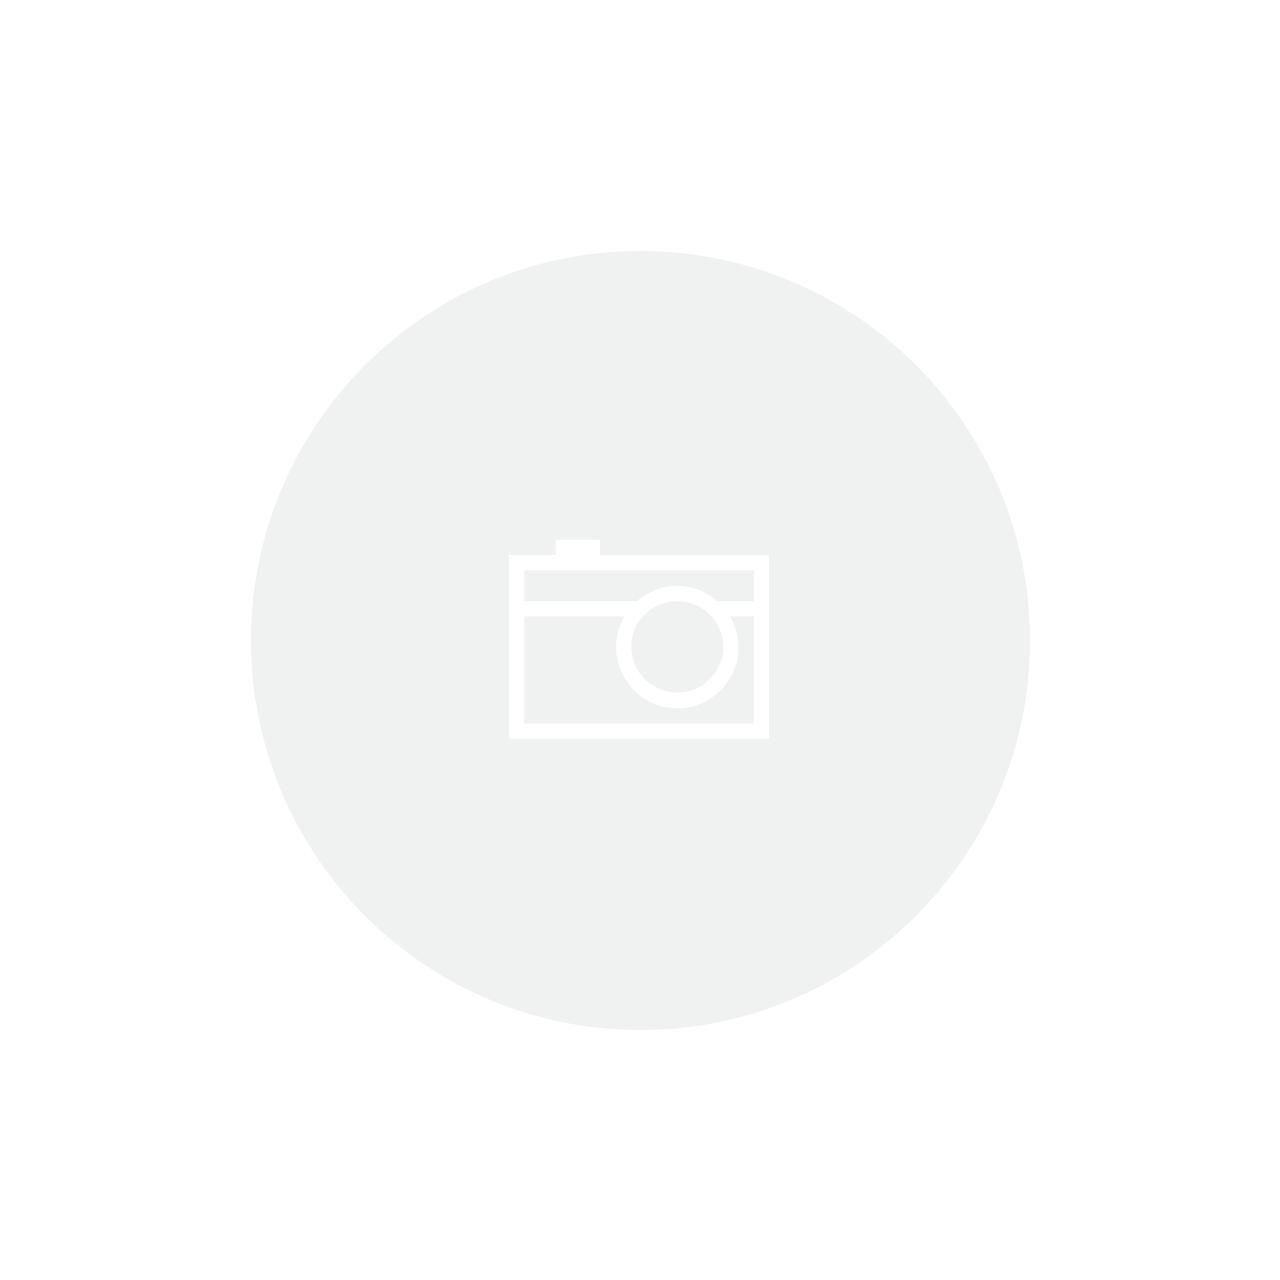 bata-ampla-c-pompons-paula-feijo-088vf17